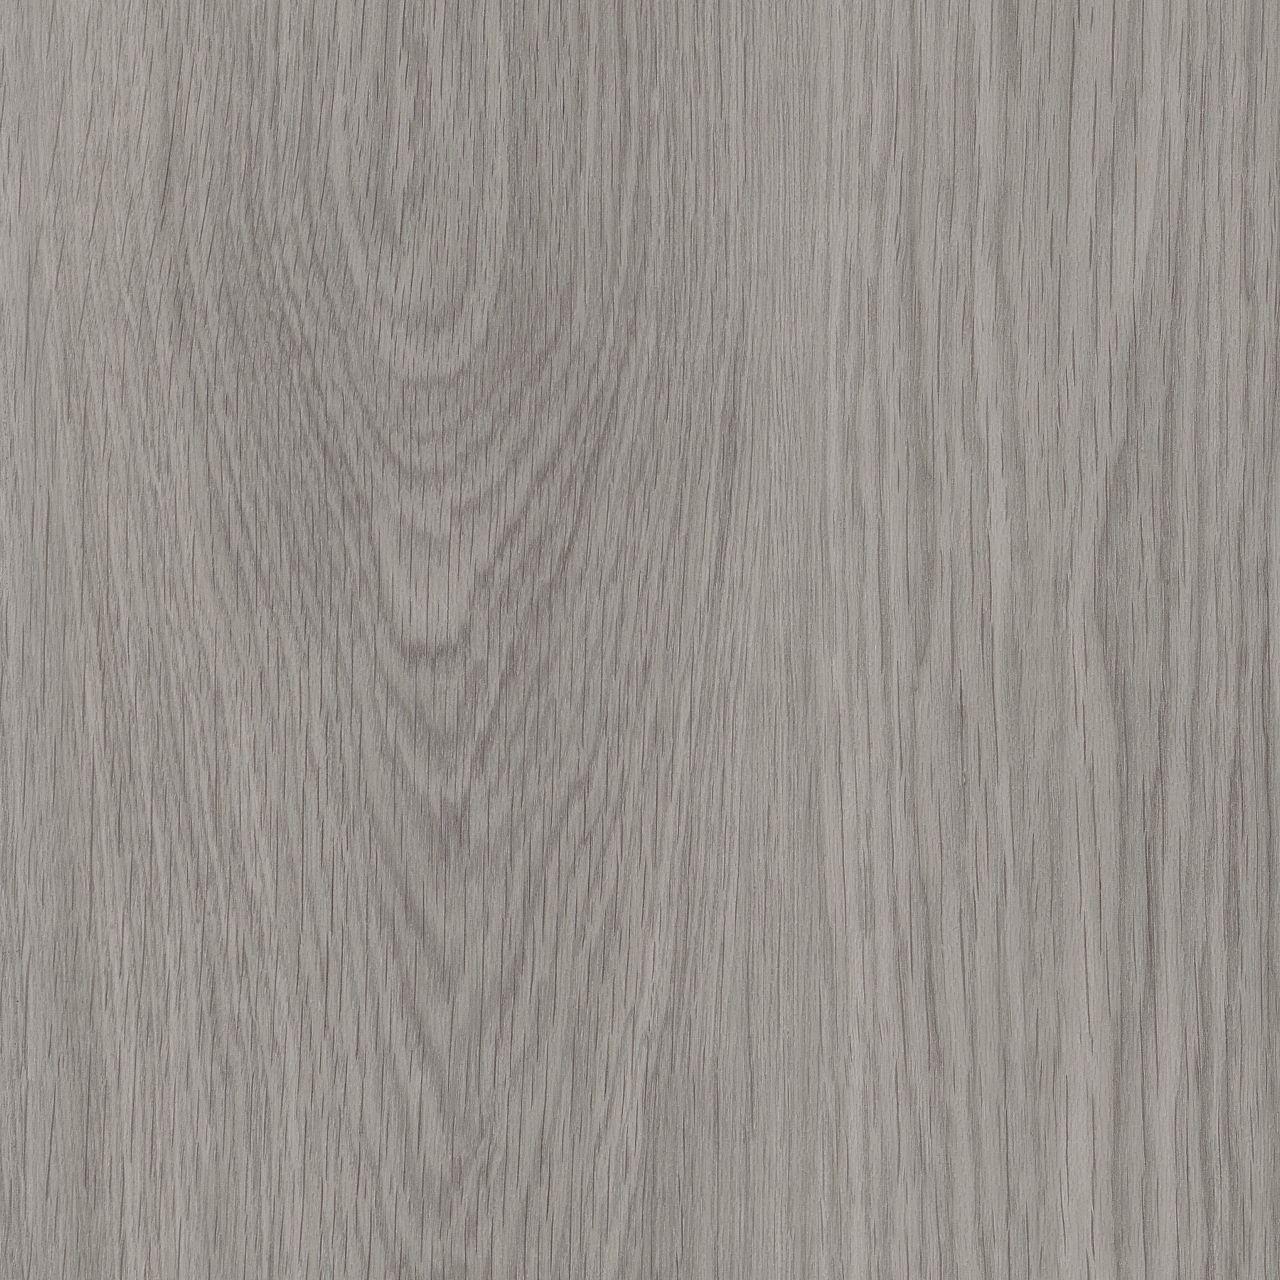 Amtico Spacia Pvc Grind Danga Nordic Oak Tico